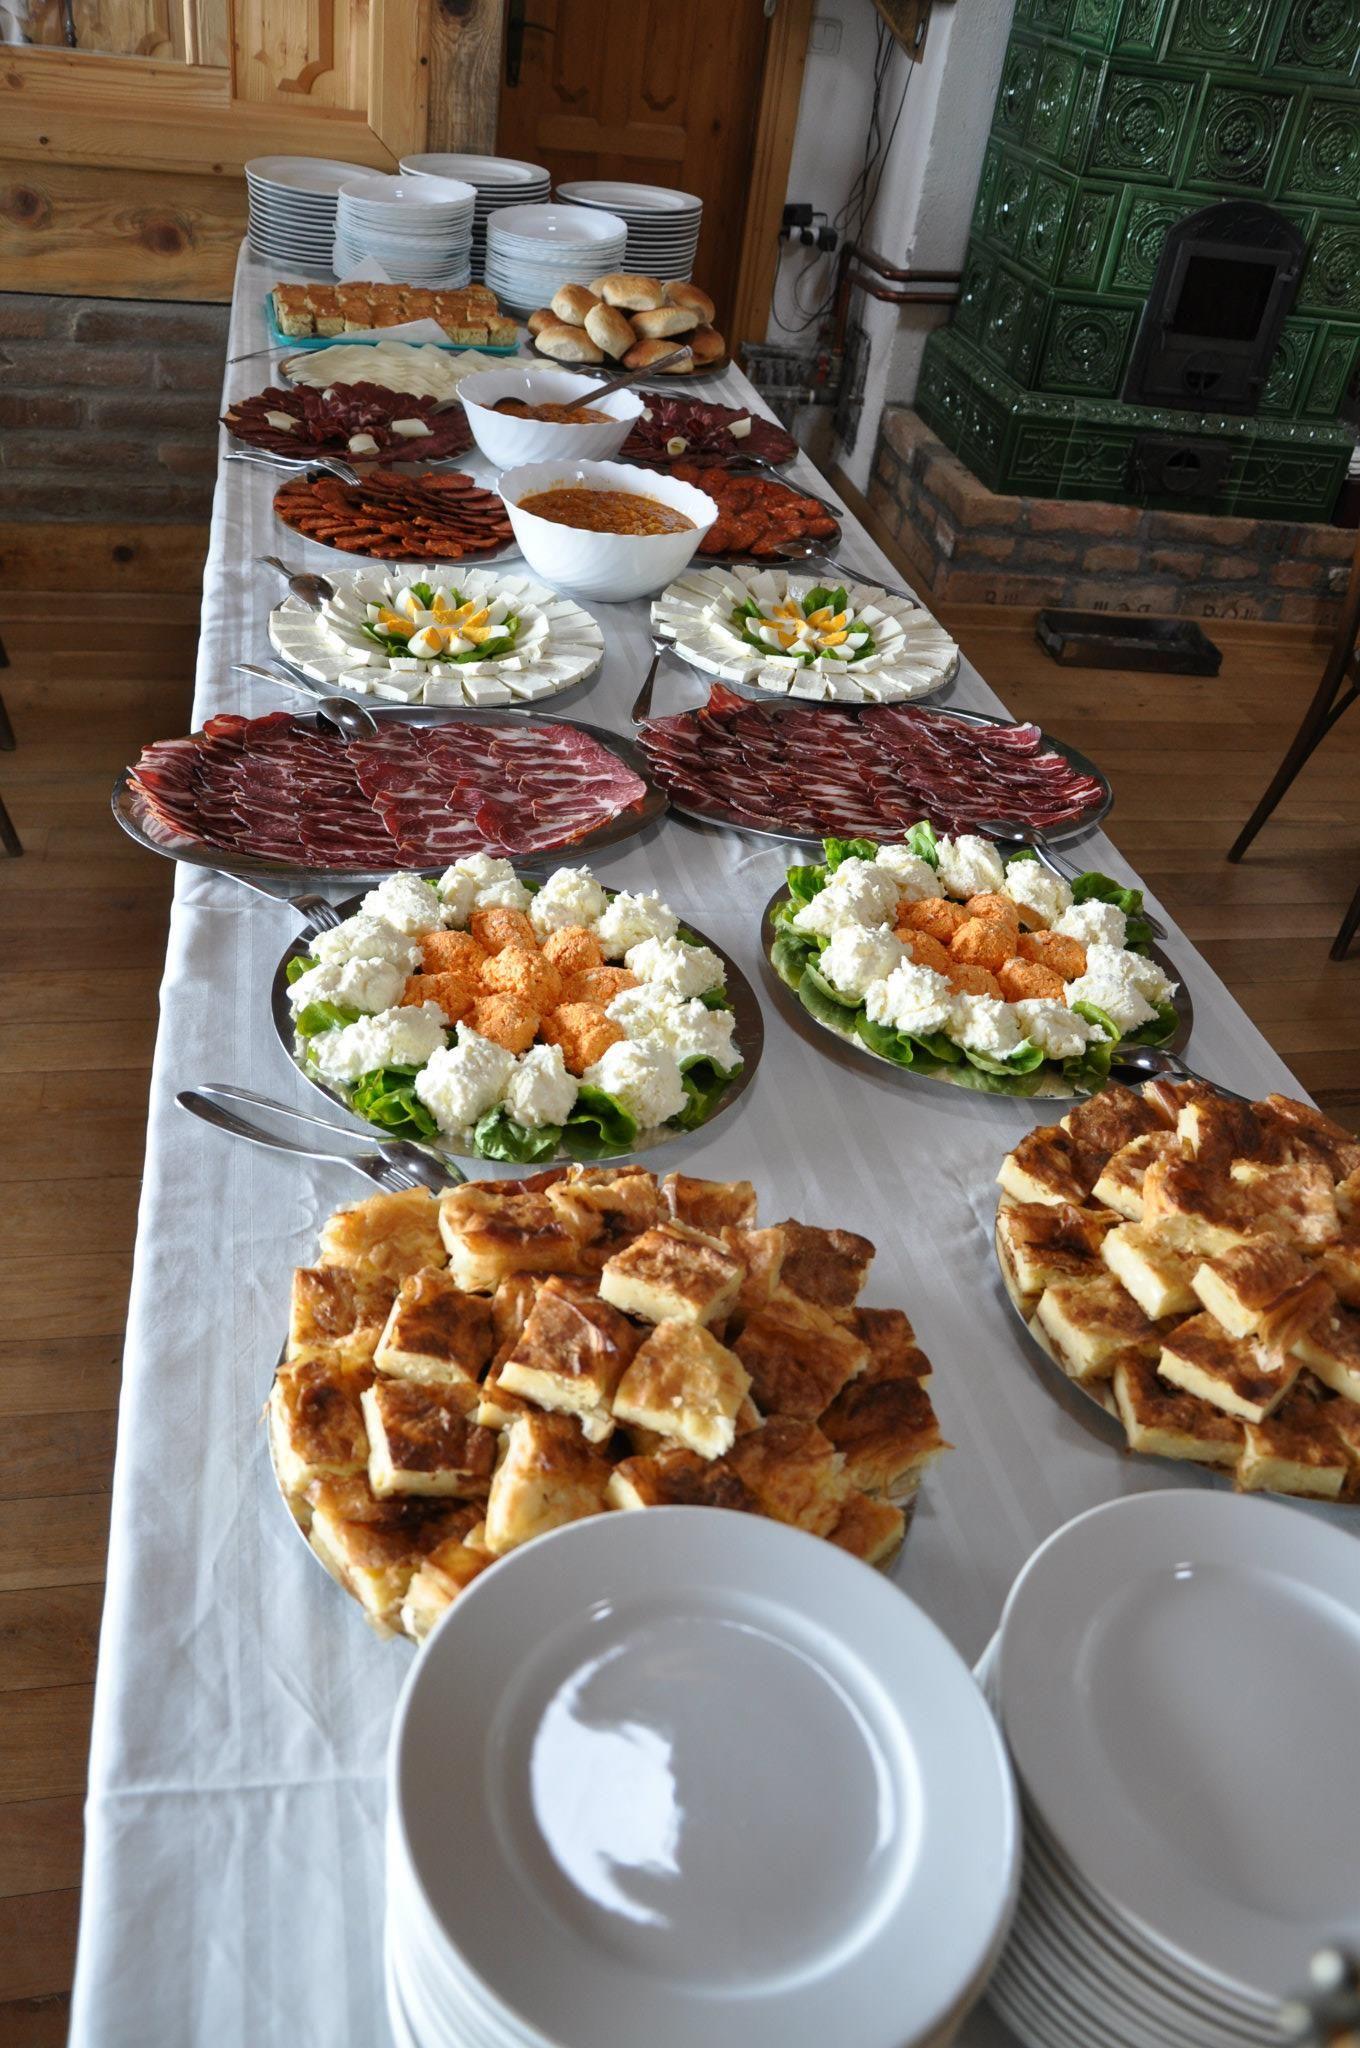 SERBIAN FOOD HOME SWEET HOME